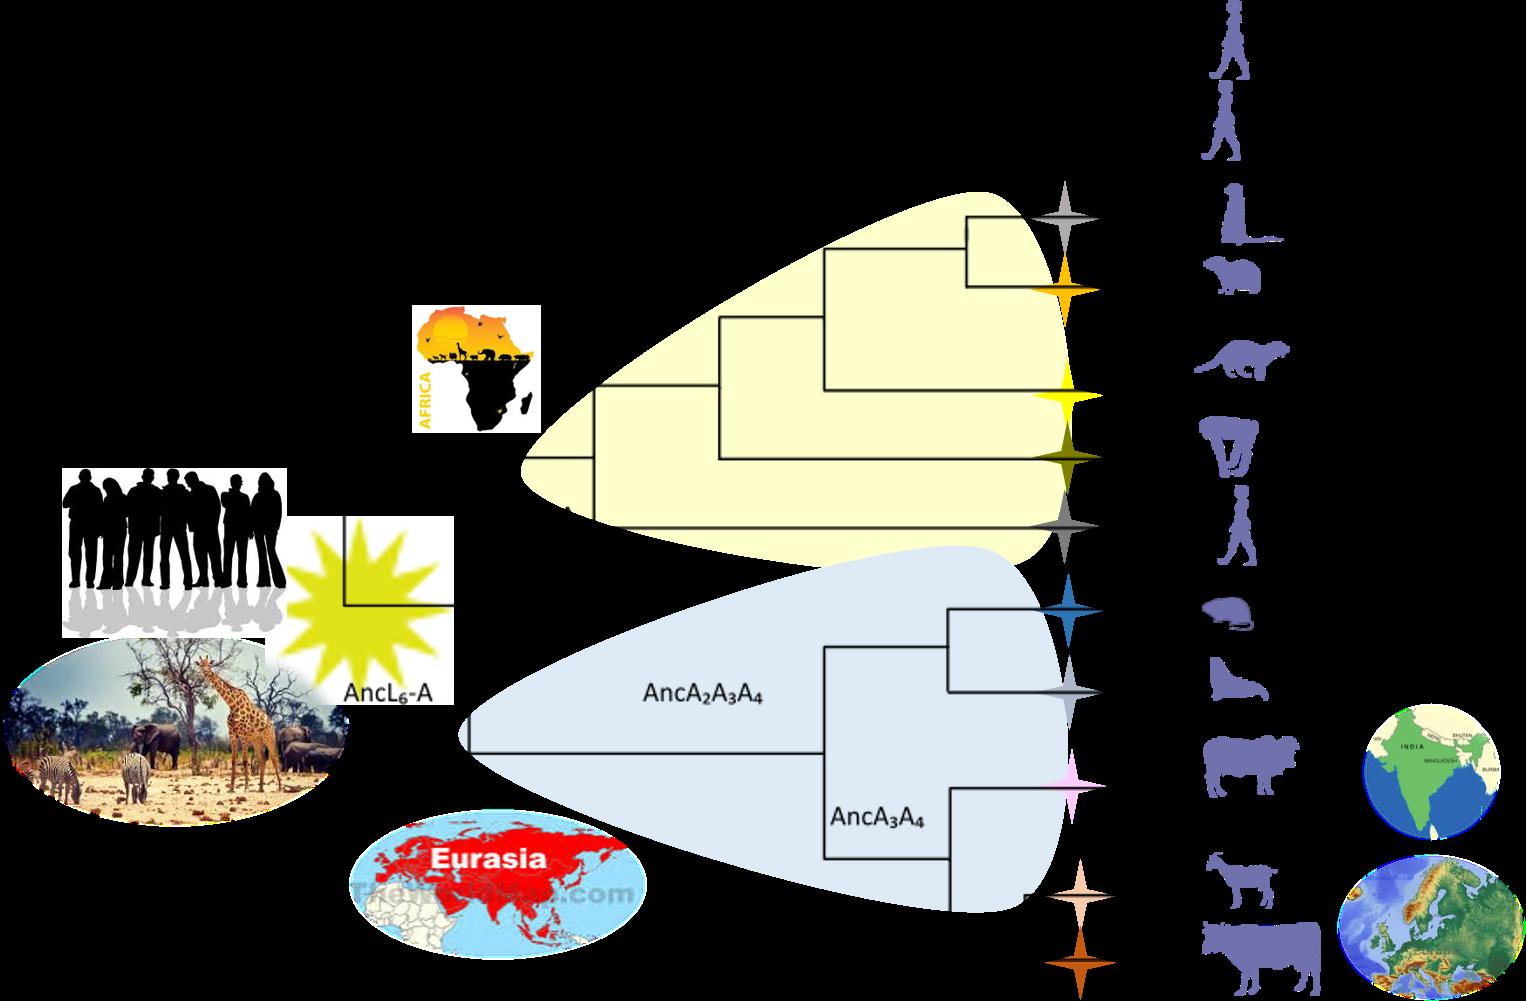 M. tuberculosis evolutionary history